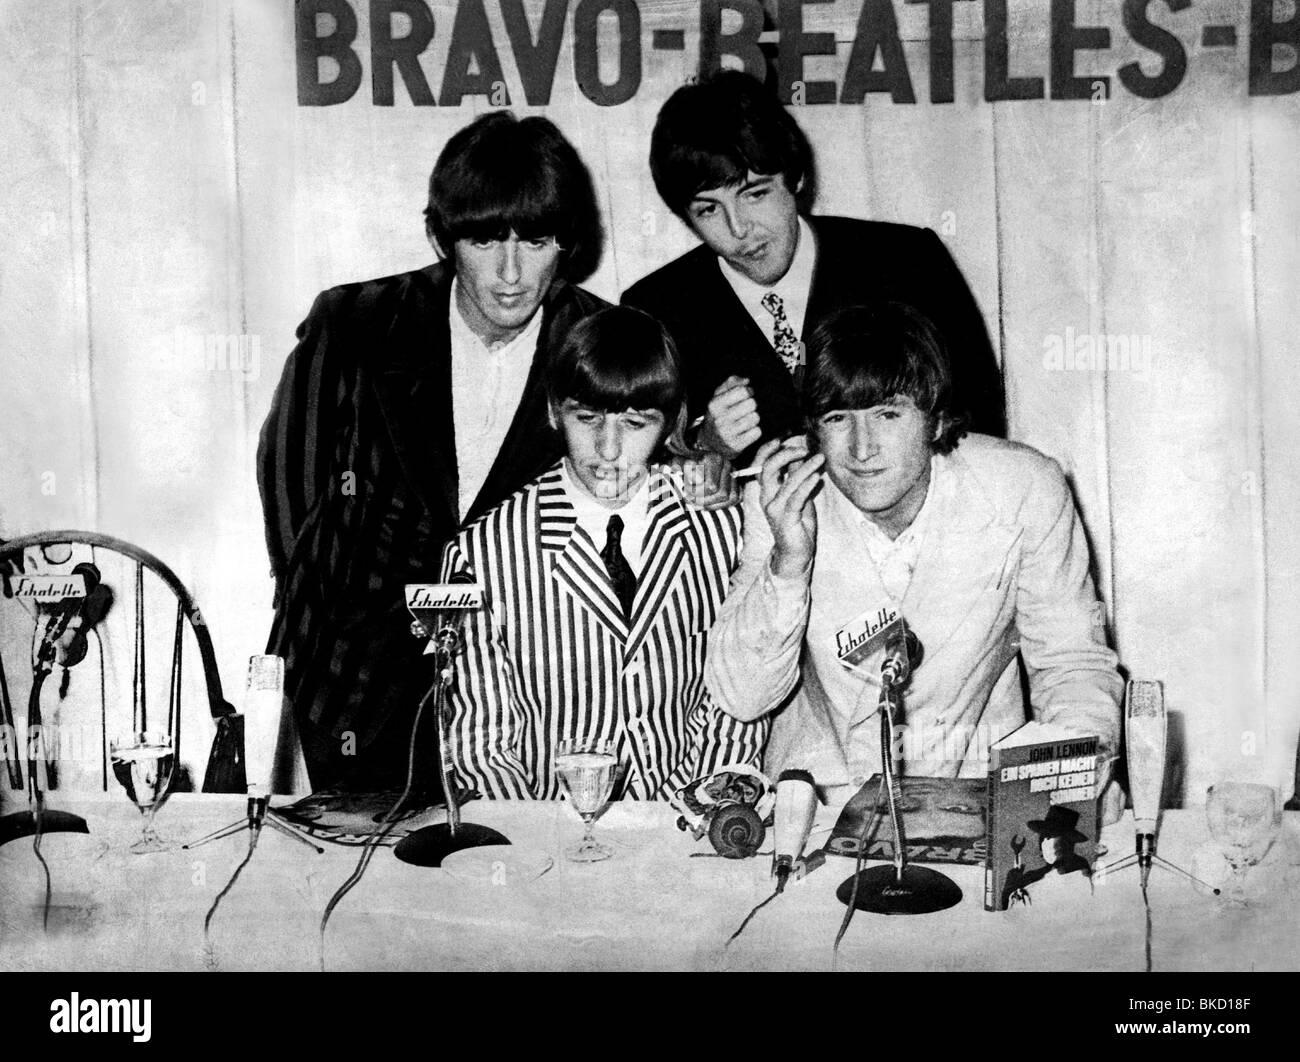 14 The Beatles English Rock Pop Band Paul McCartney John Lennon Poster Photo